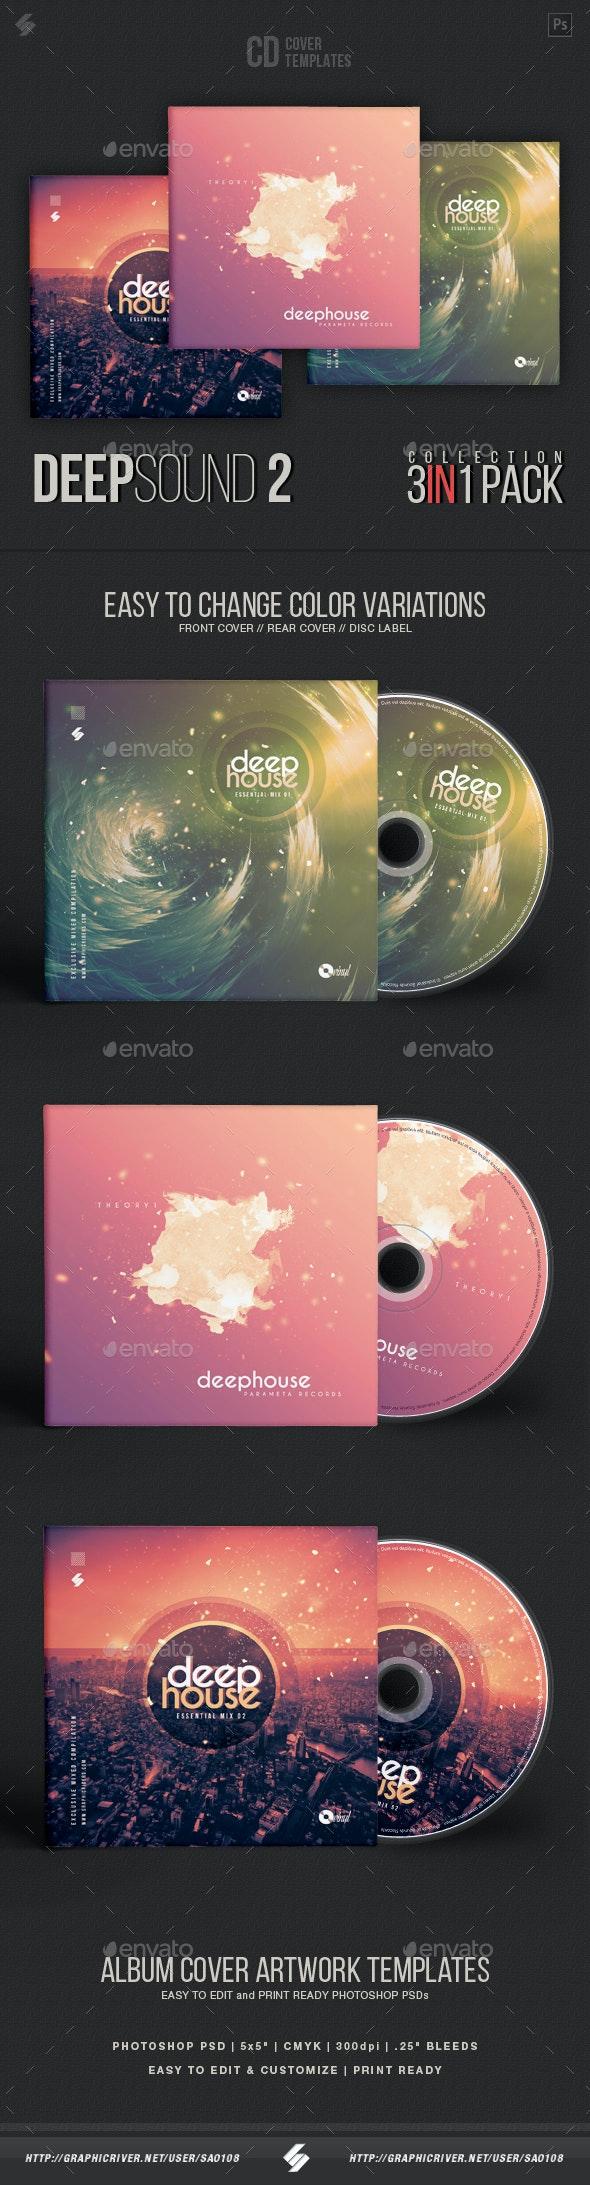 Deep Sound Collection 2 - CD Cover Artwork Templates Bundle